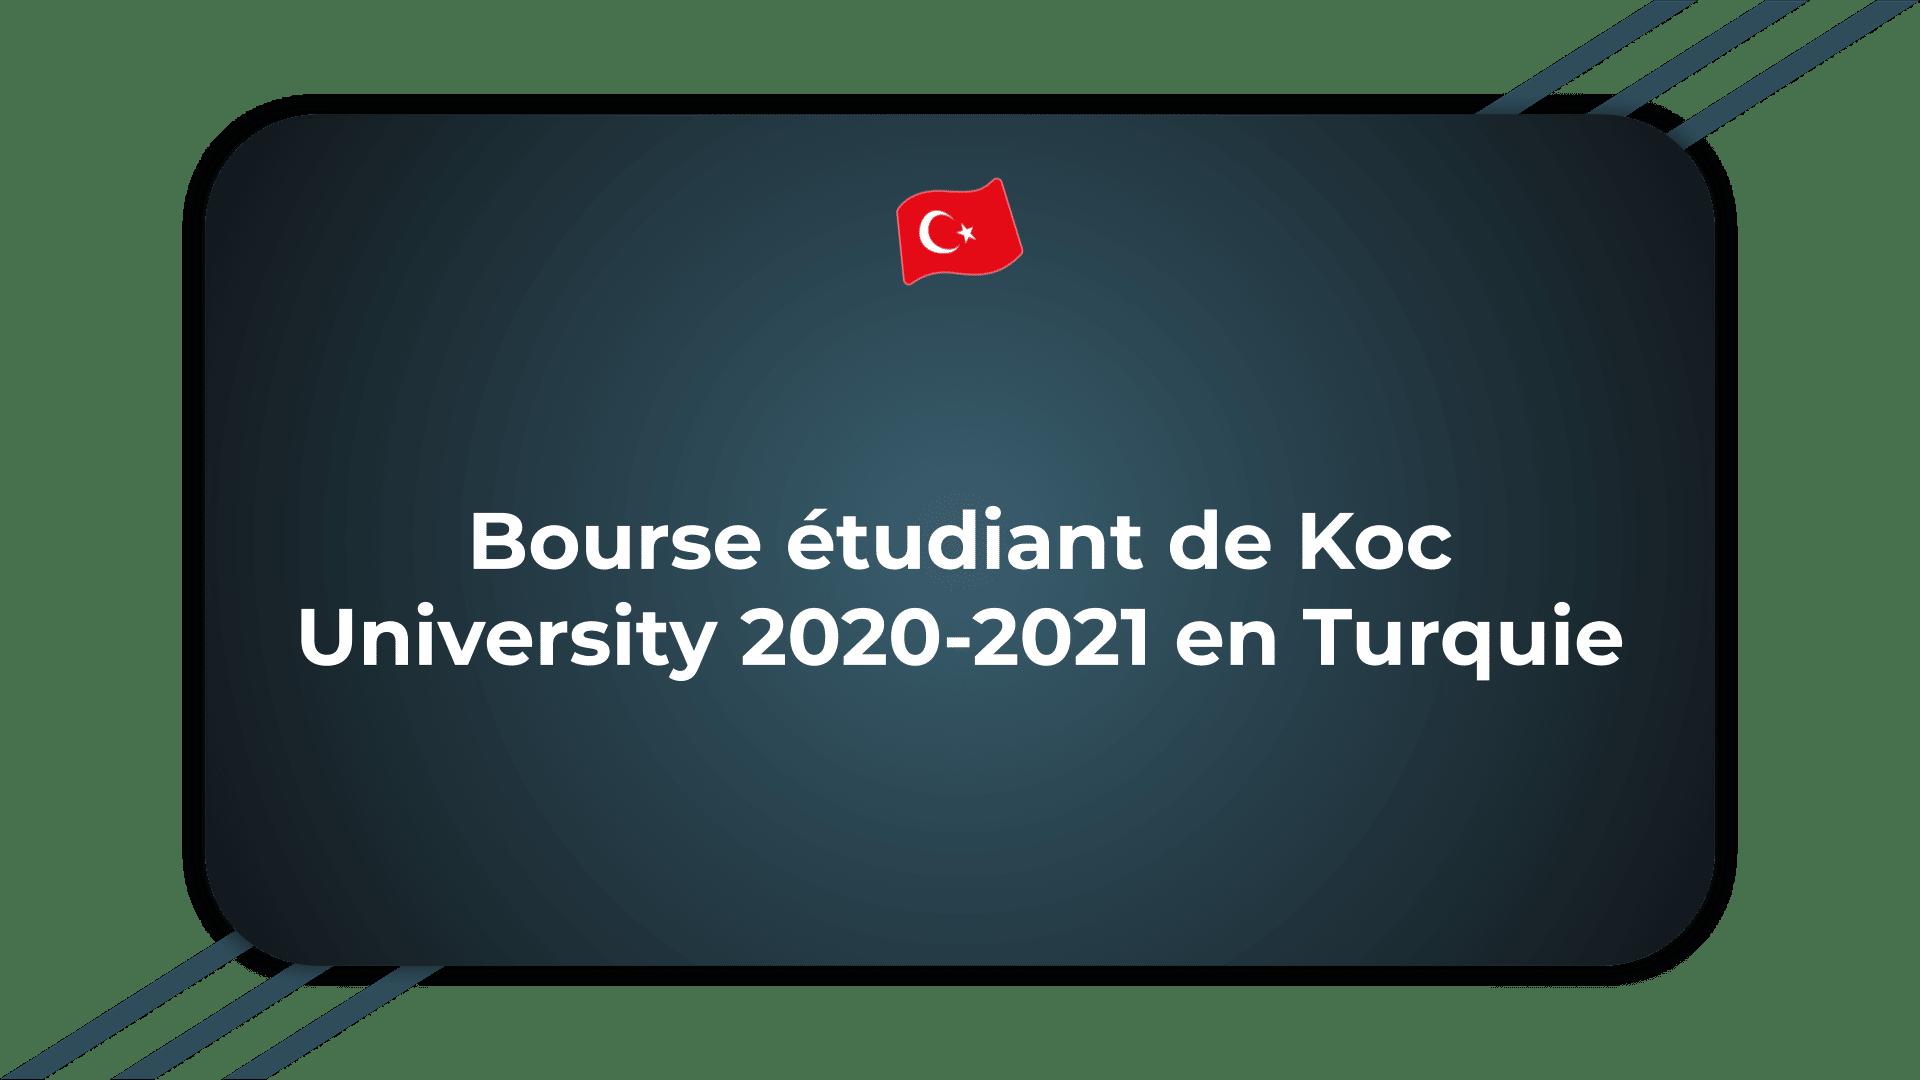 Bourse étudiant Koc University